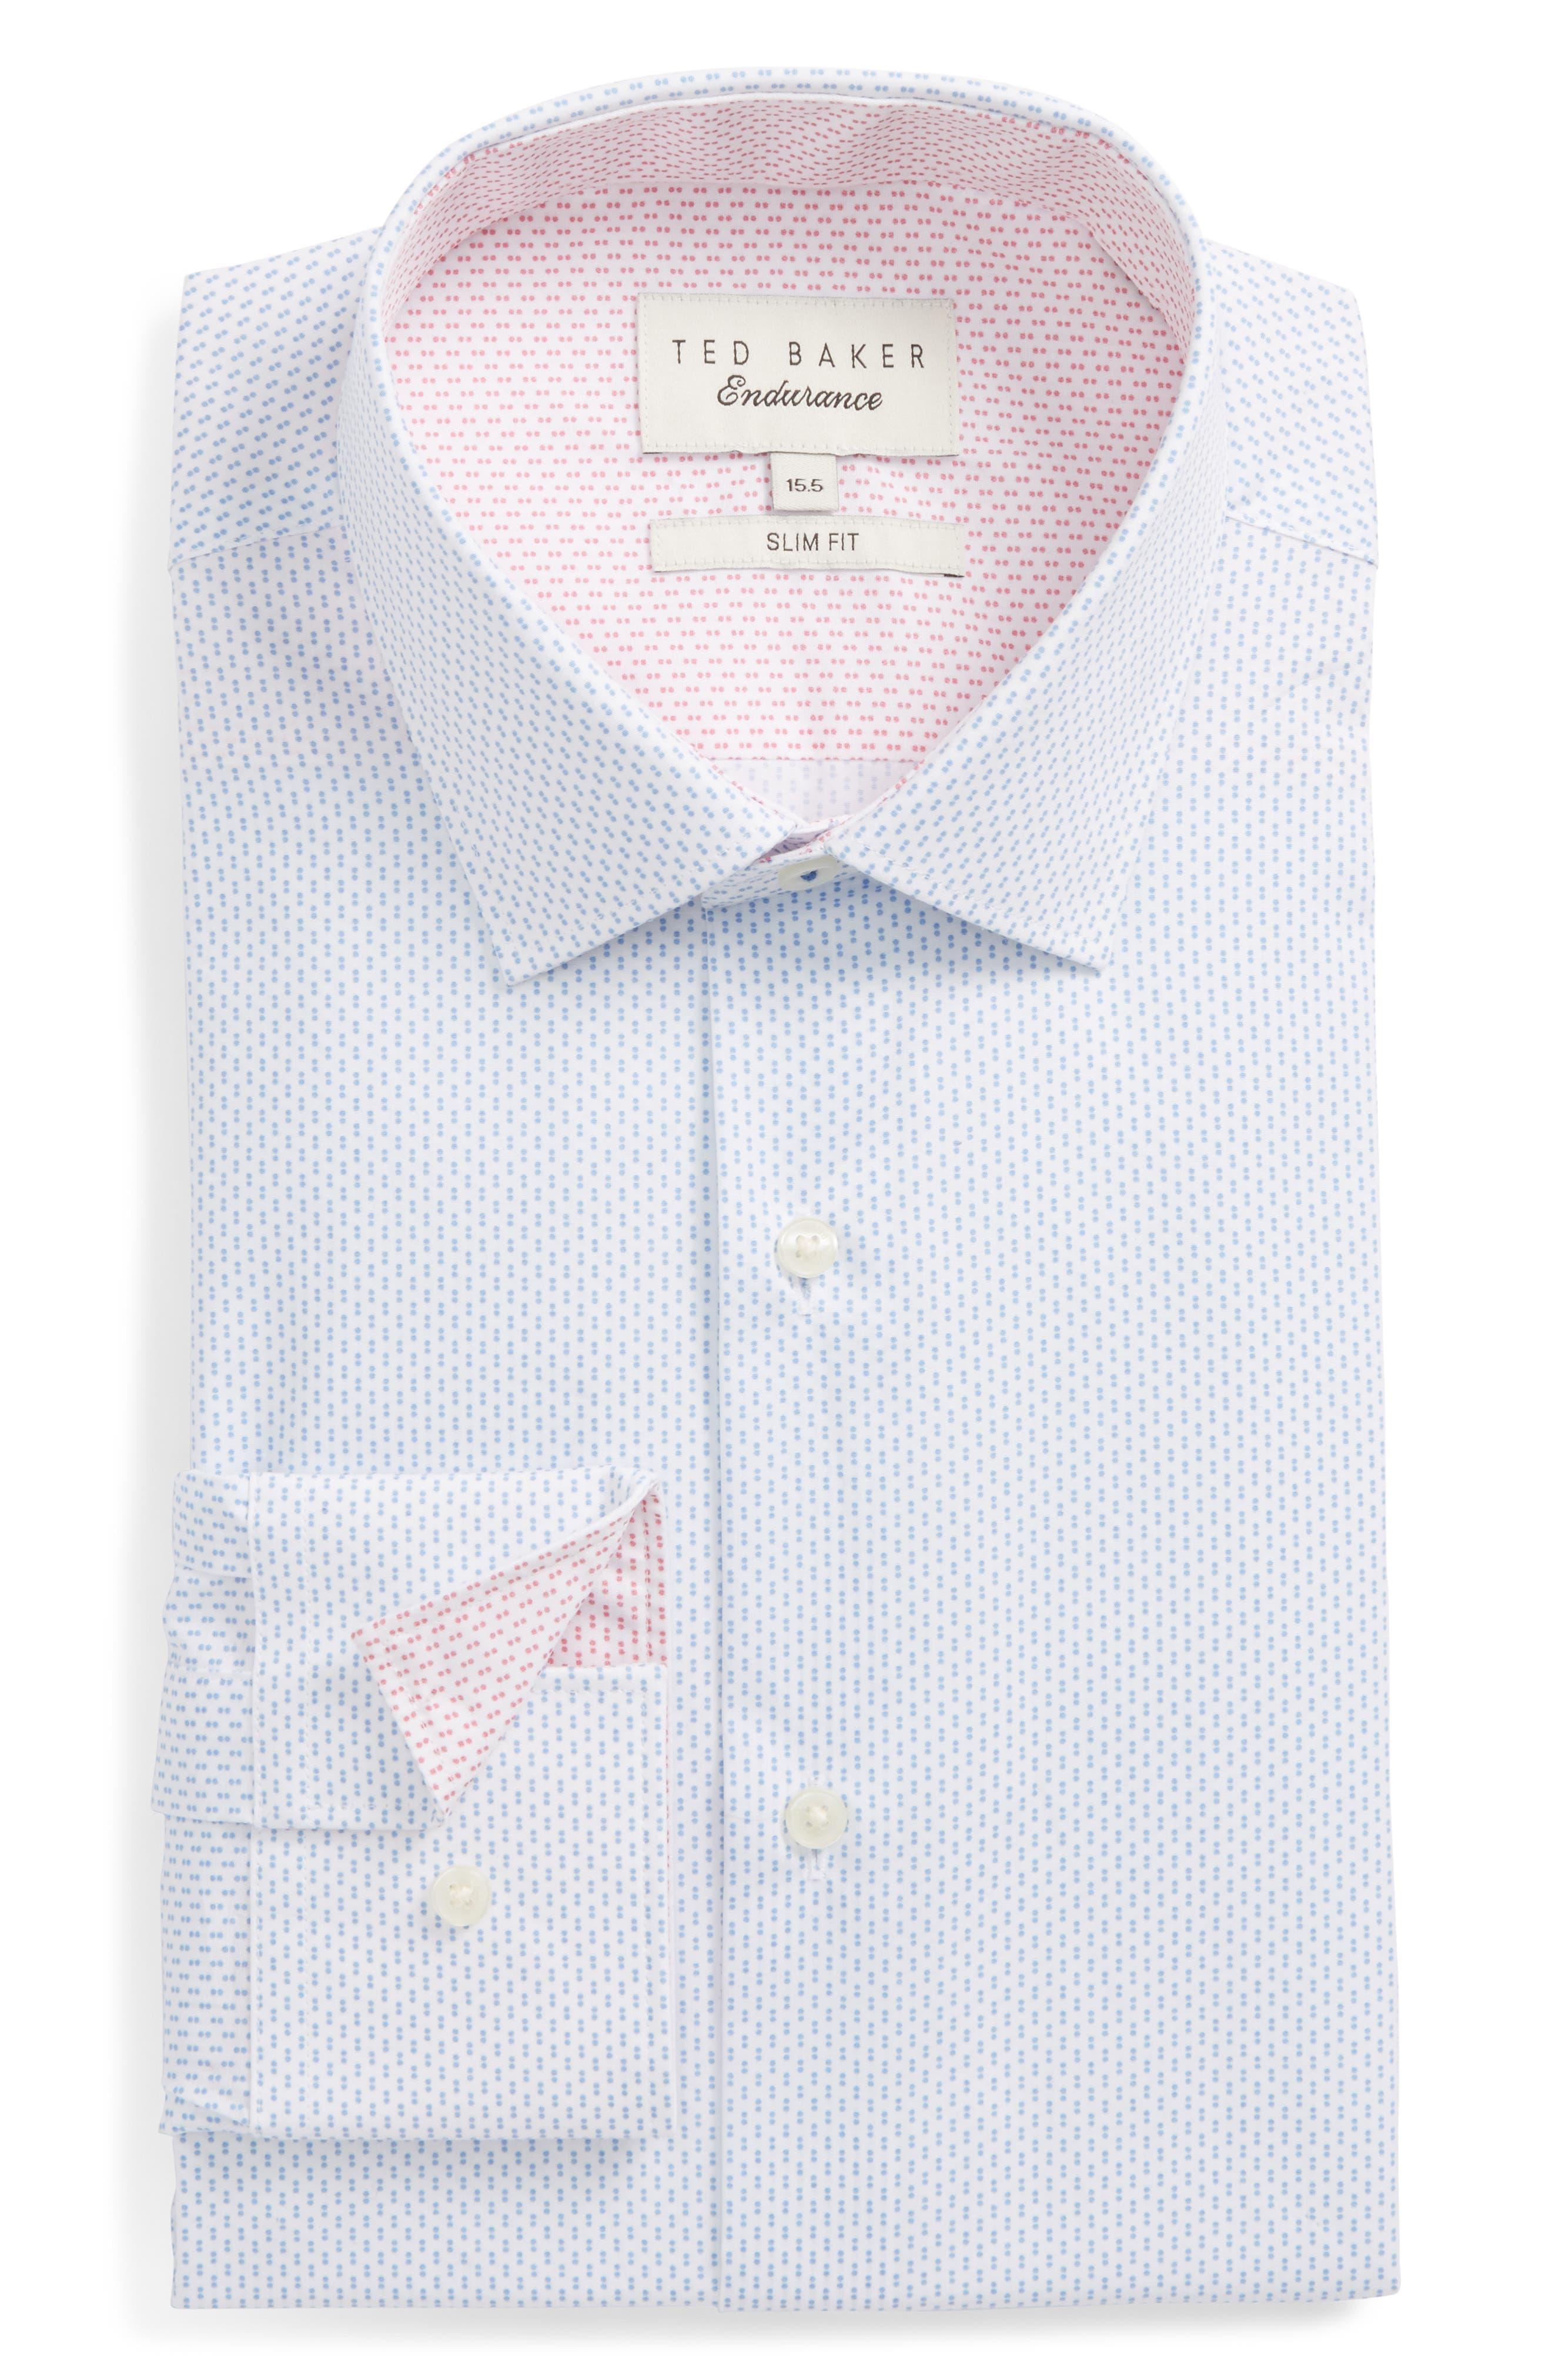 Endurance Barged Slim Fit Double Dot Dress Shirt,                             Main thumbnail 1, color,                             Blue